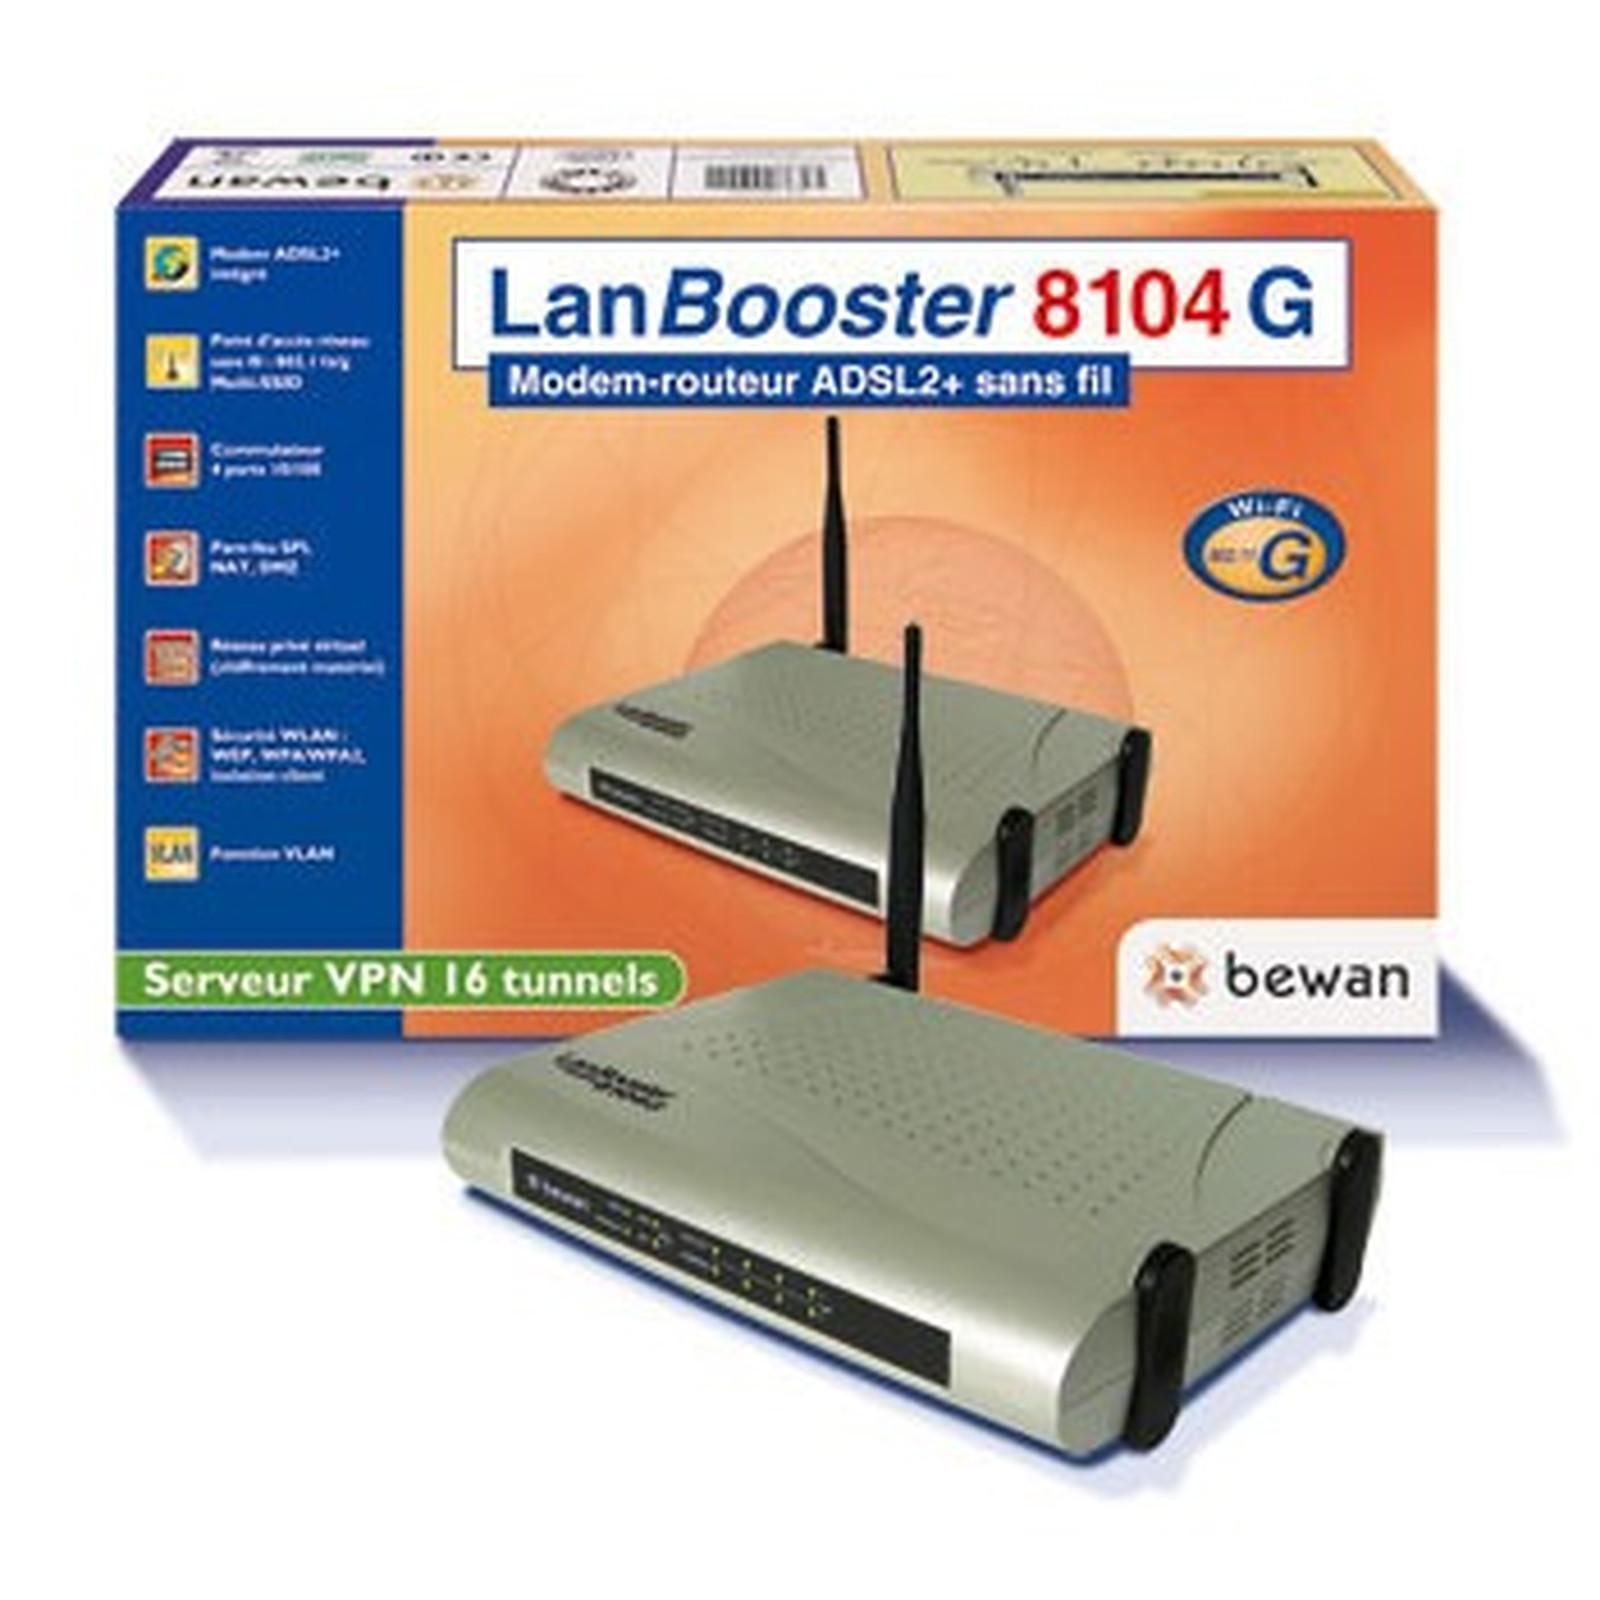 Bewan 700 ADSL2+ Drivers Windows 7